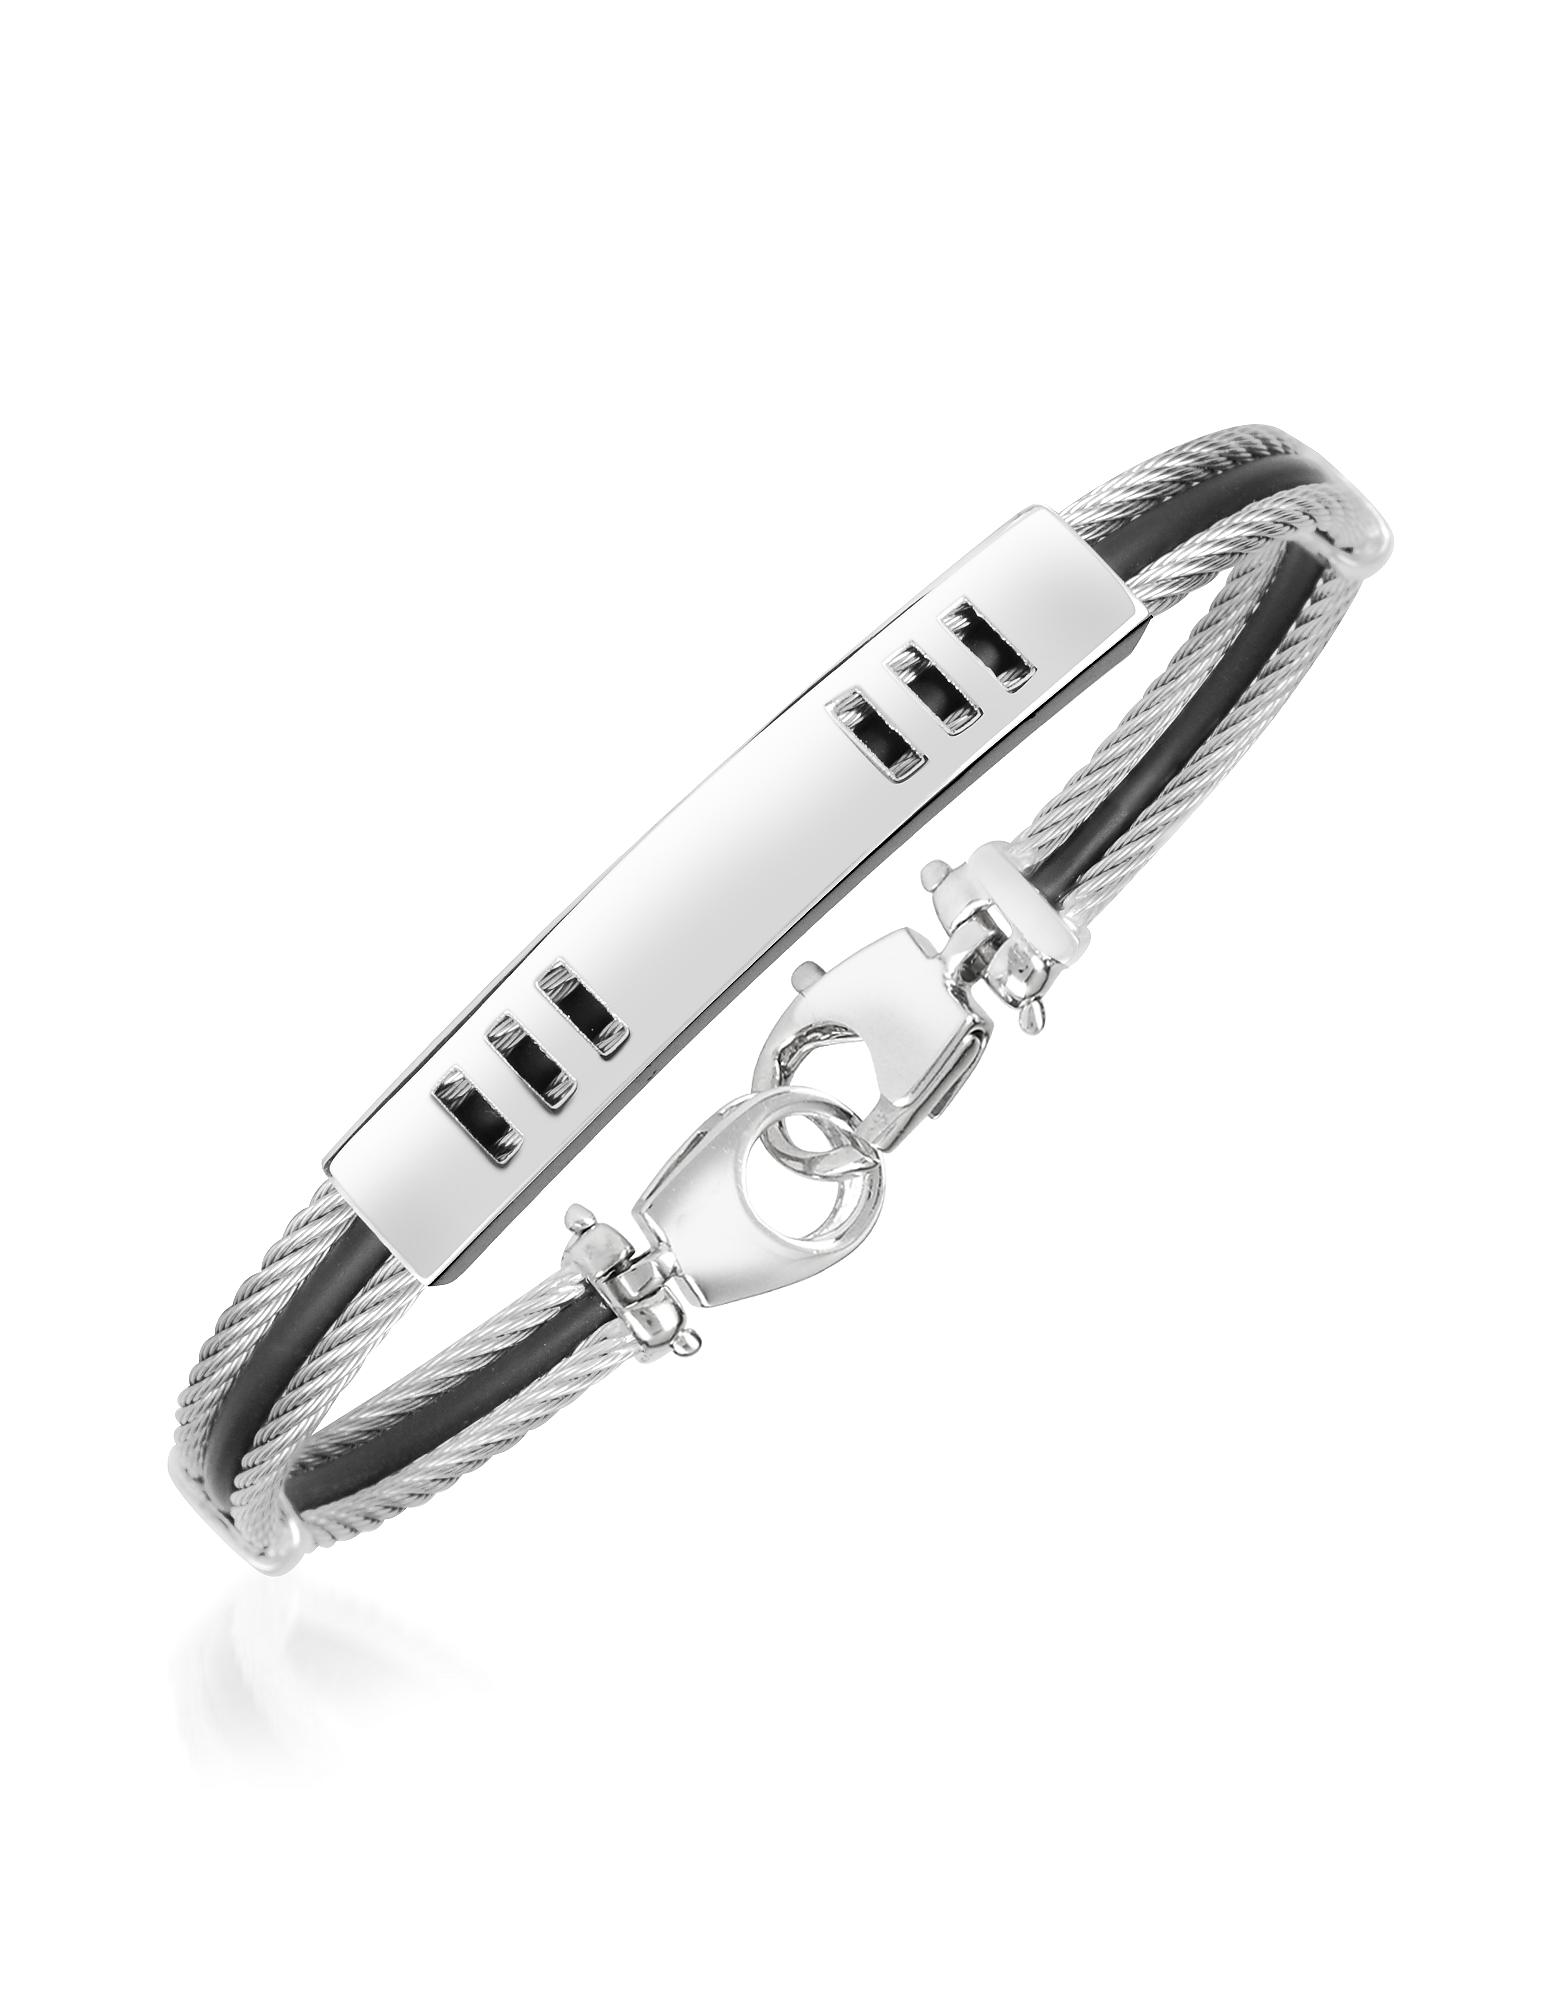 Forzieri Men's Bracelets, Di Fulco Line Stainless Steel Men's Bracelet